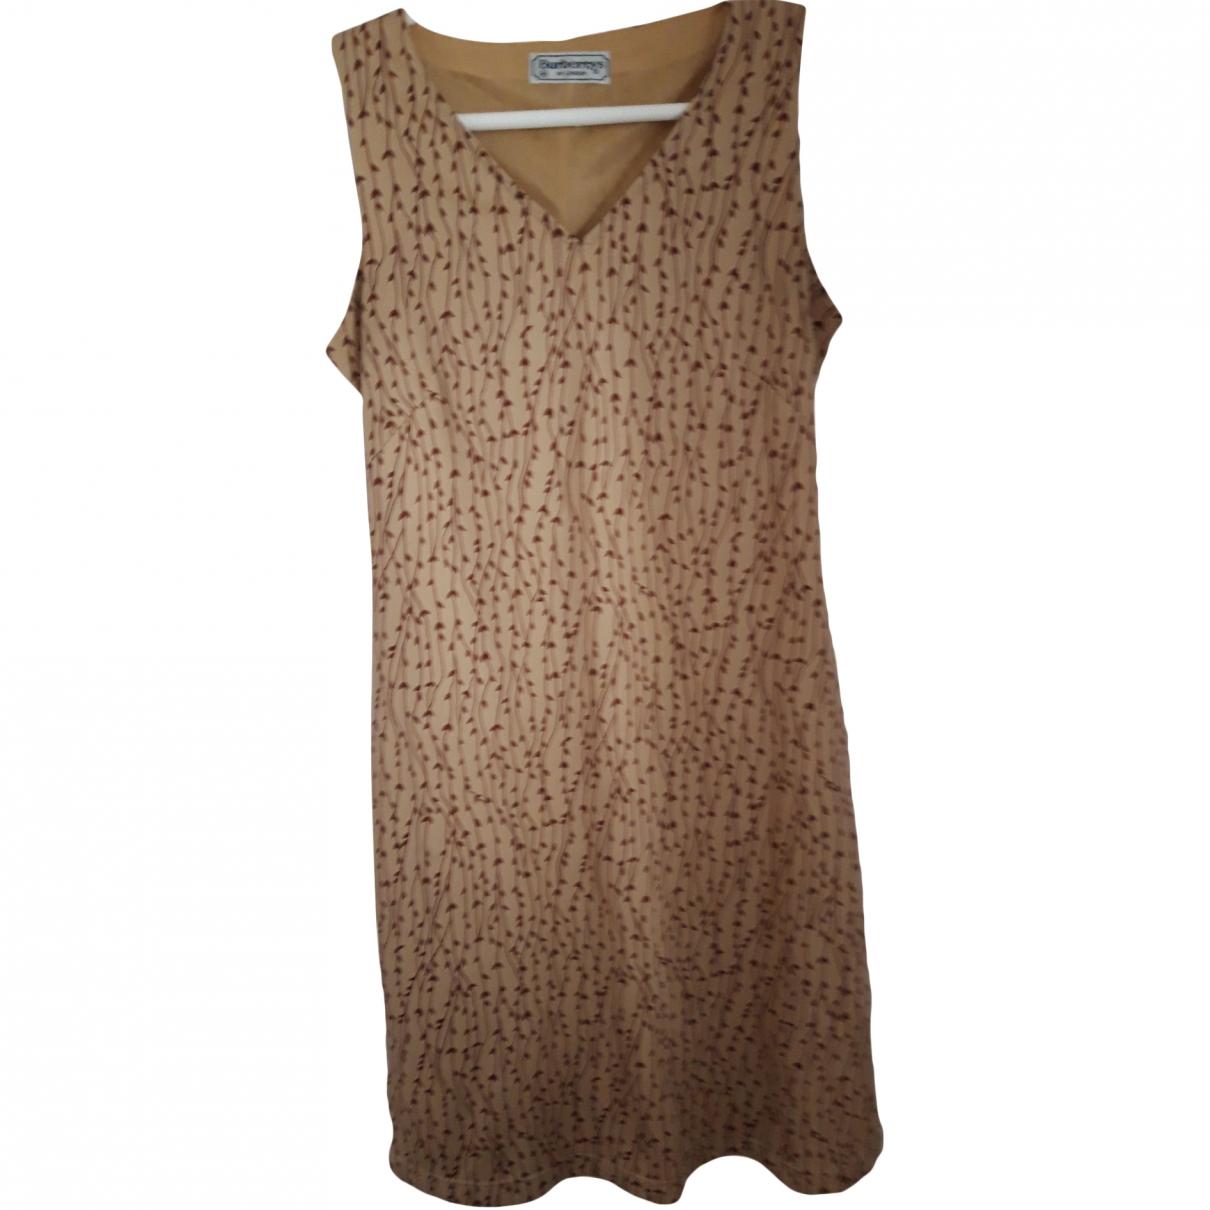 Burberry \N Beige dress for Women 40 FR